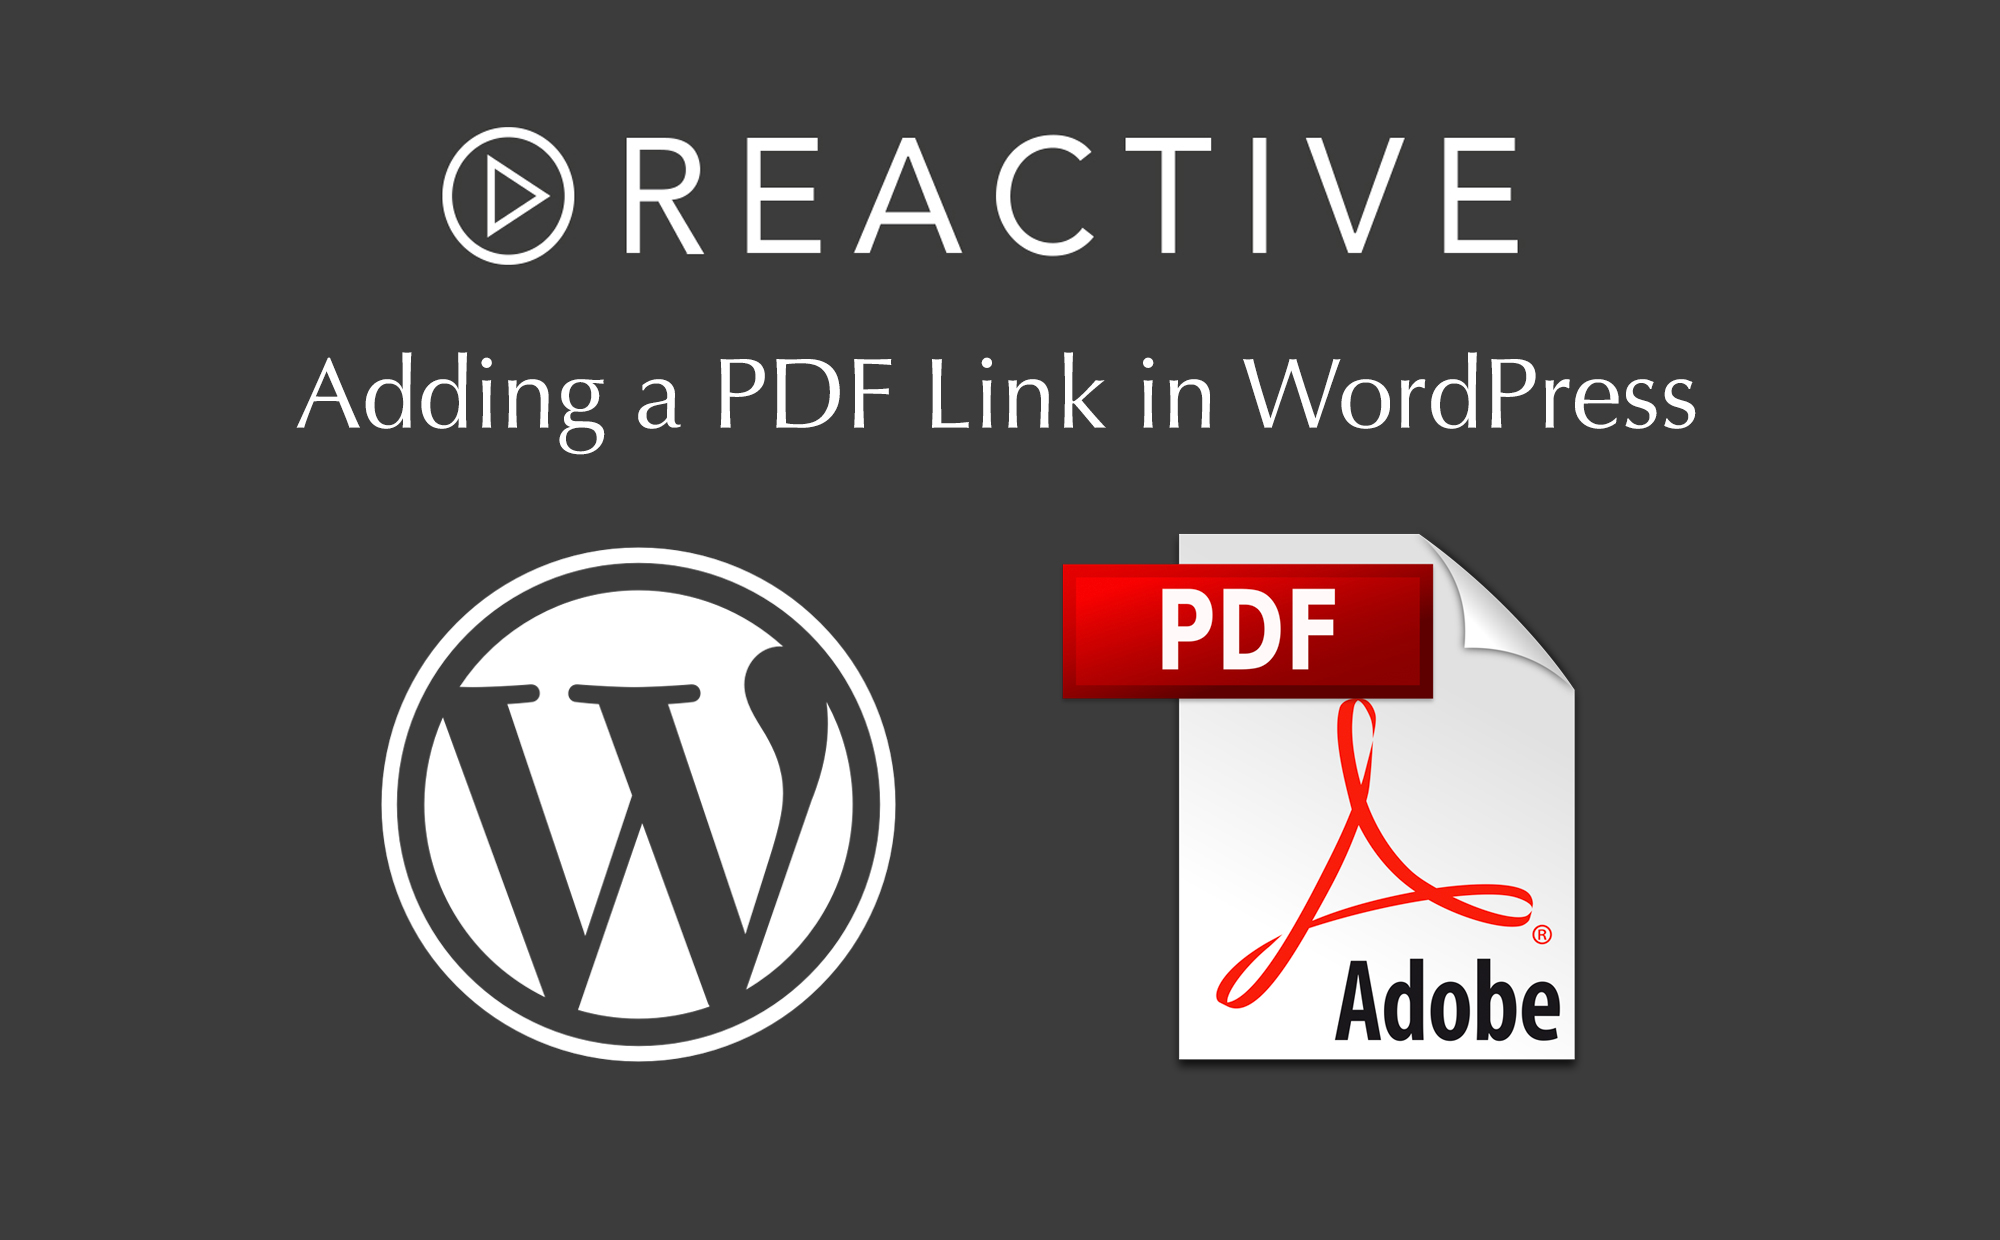 Adding a PDF link in WordPress